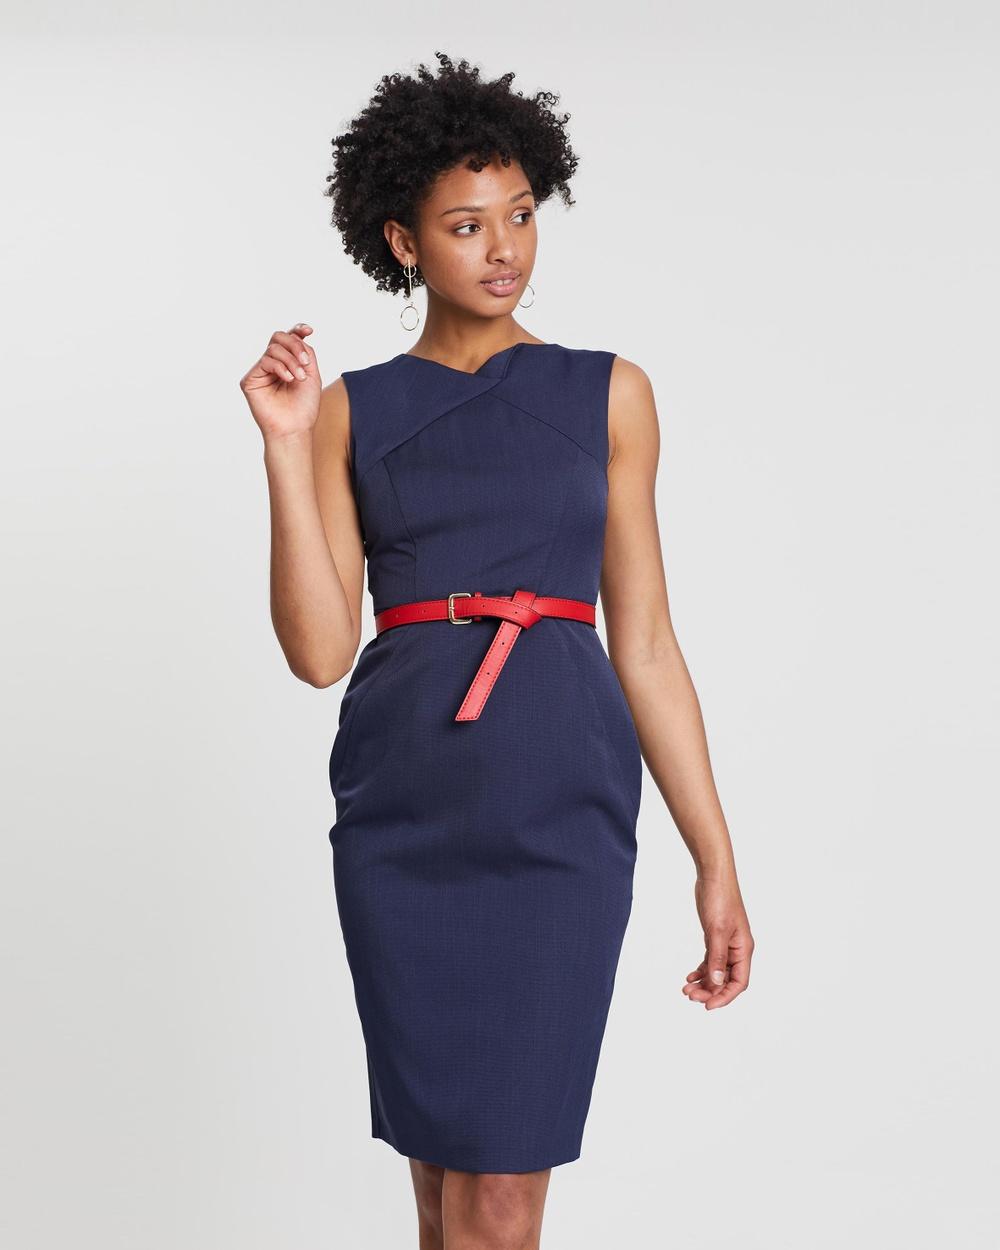 Dorothy Perkins Navy Blue Textured Folded Neck Pencil Dress